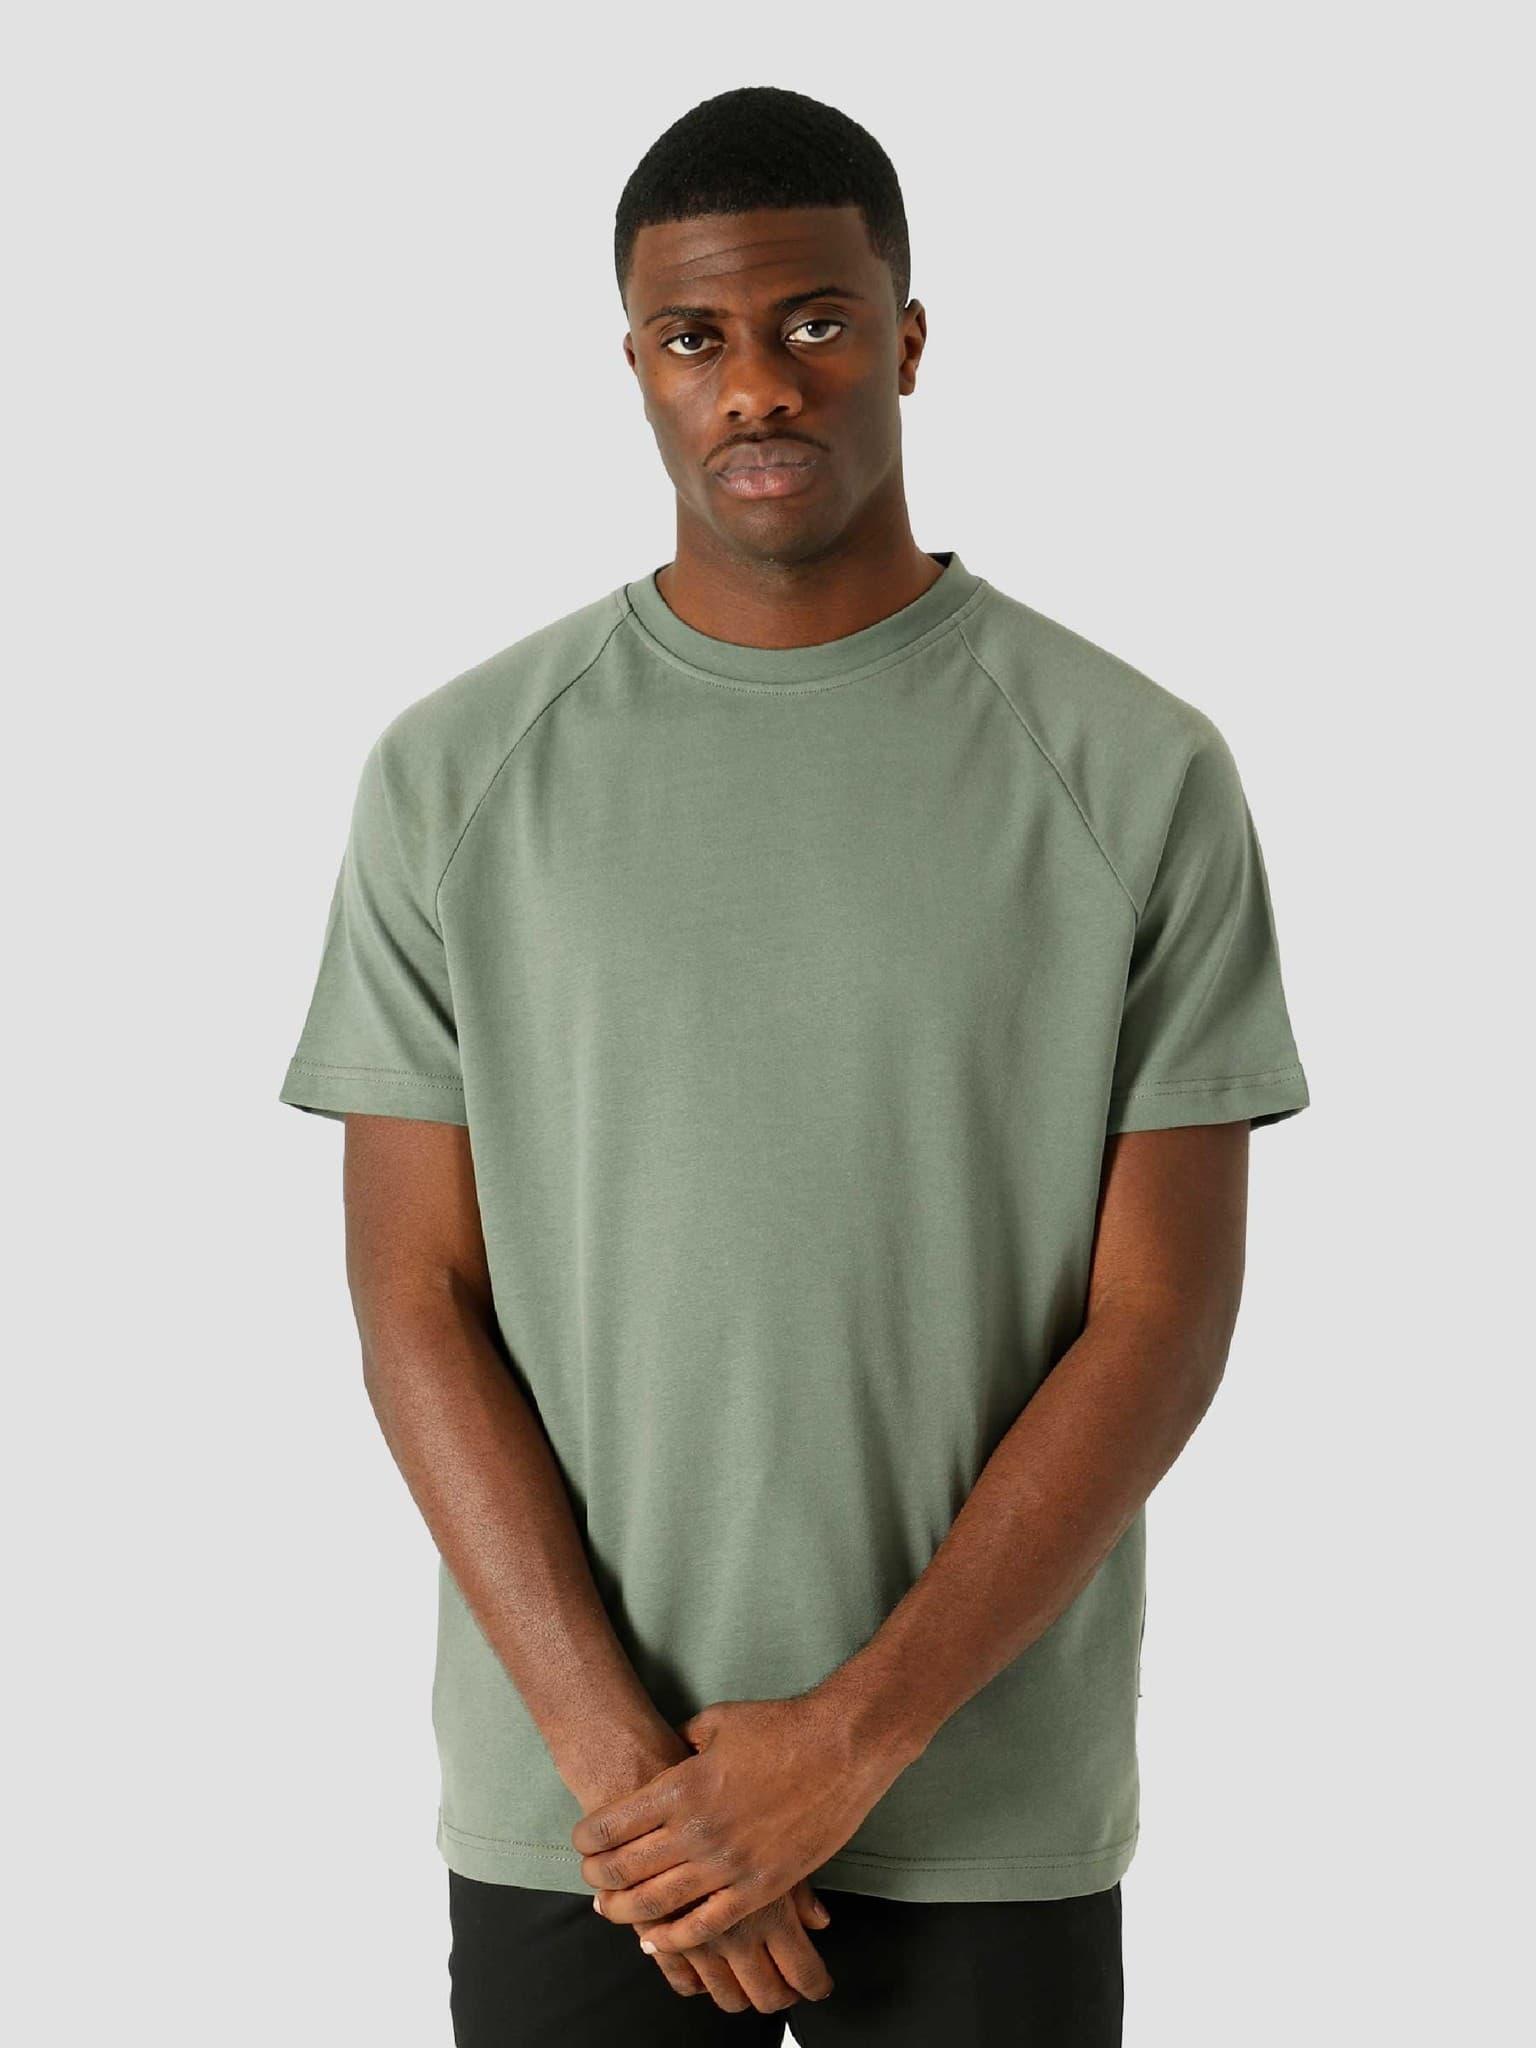 QB302 Heavy Raglan T-shirt Olive